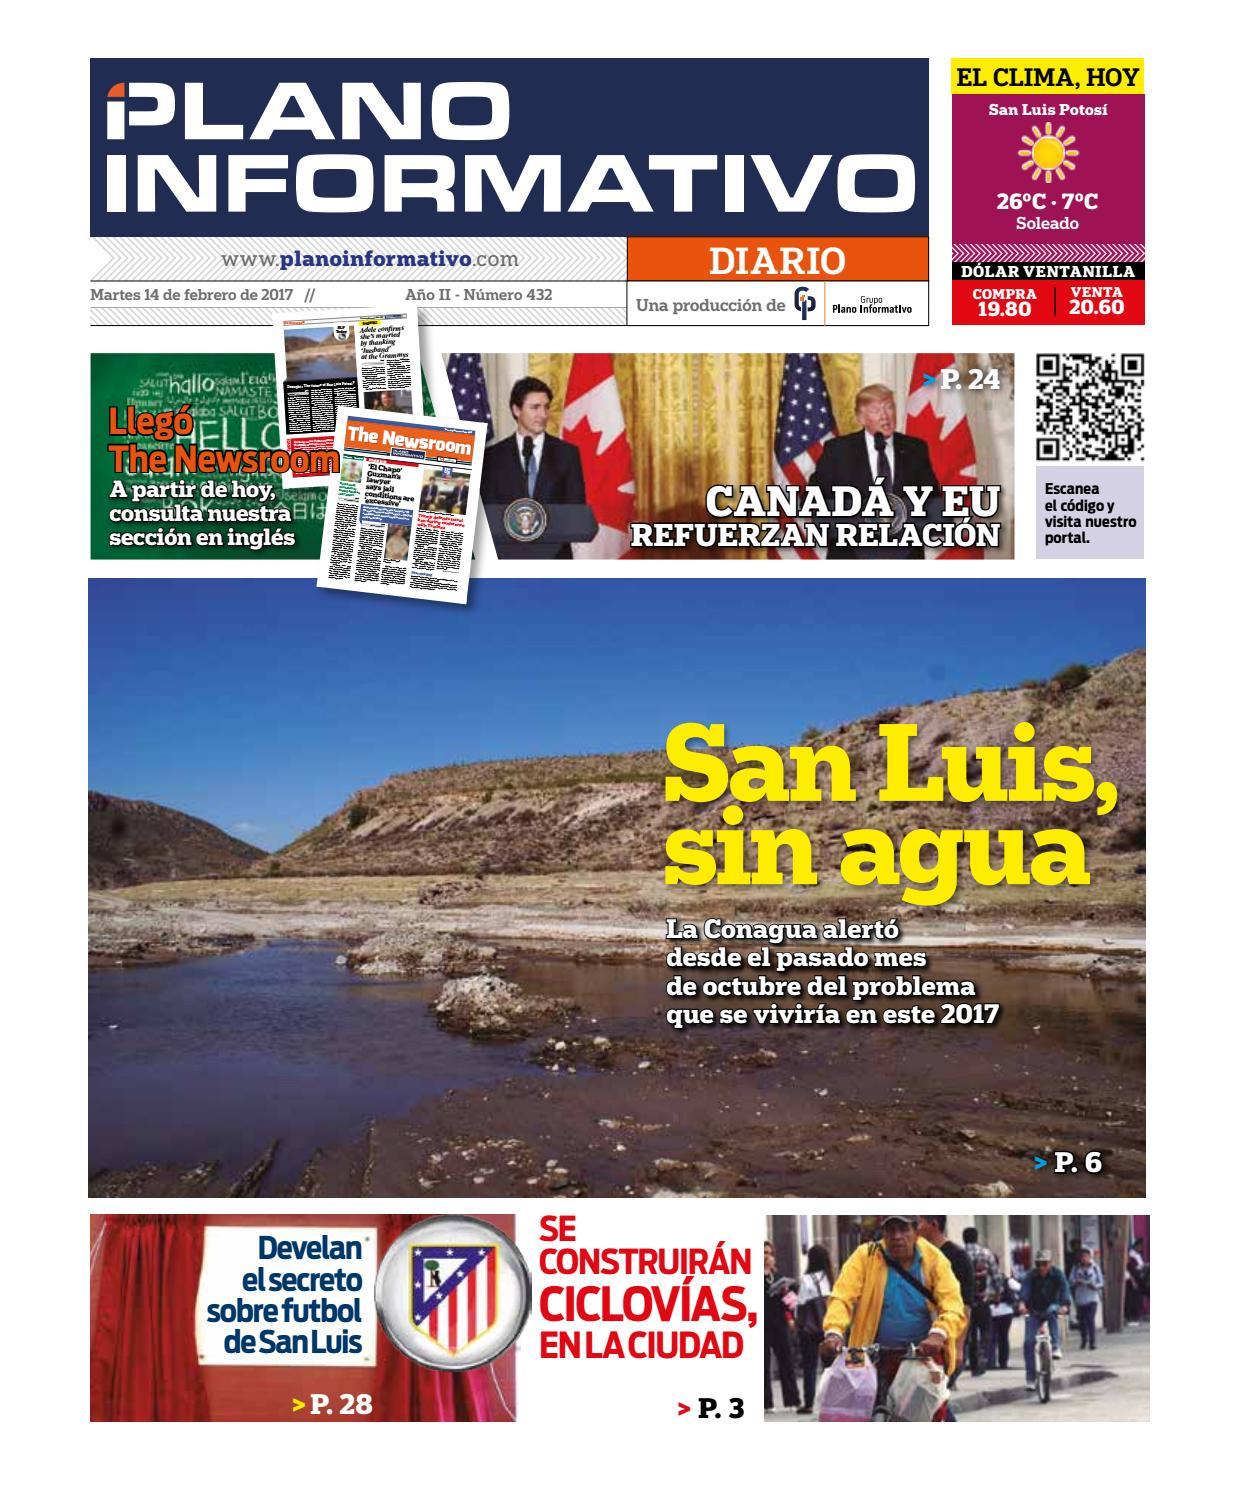 Plano Informativo Impreso Año 2, No. 432 by Plano Informativo - issuu